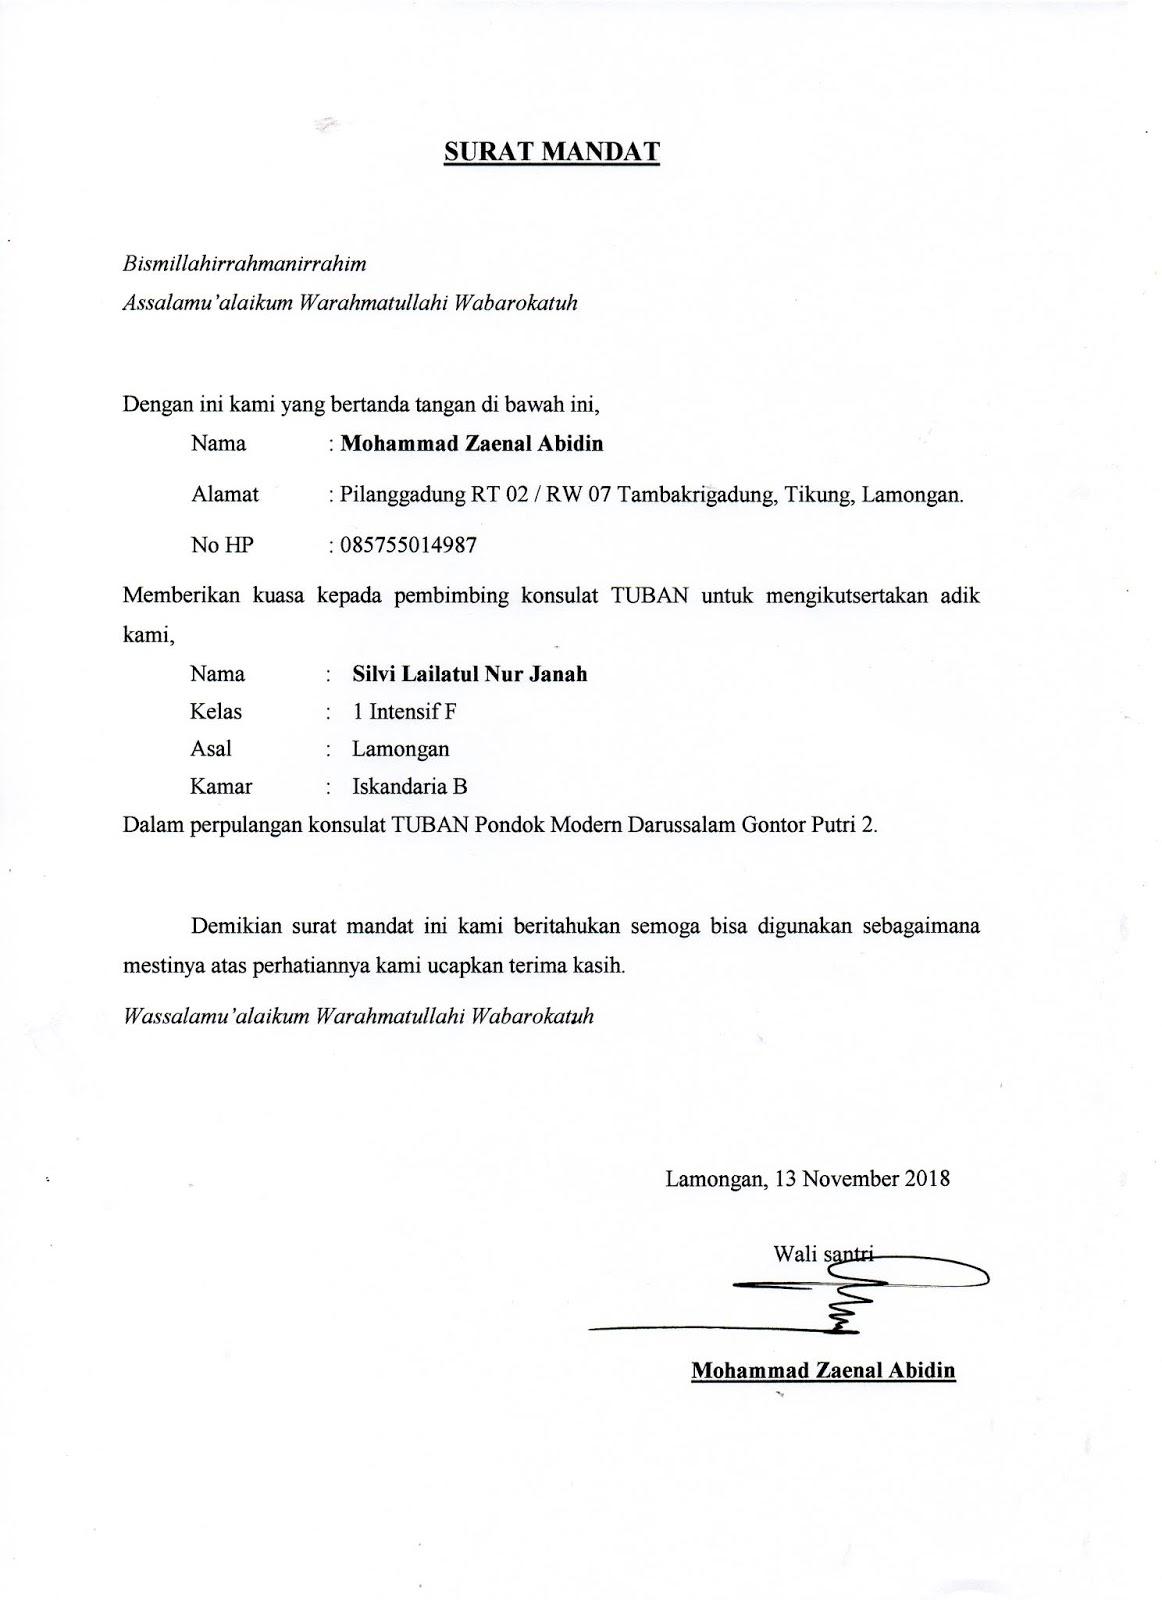 Edufunia Blog Contoh Surat Mandat Gontor